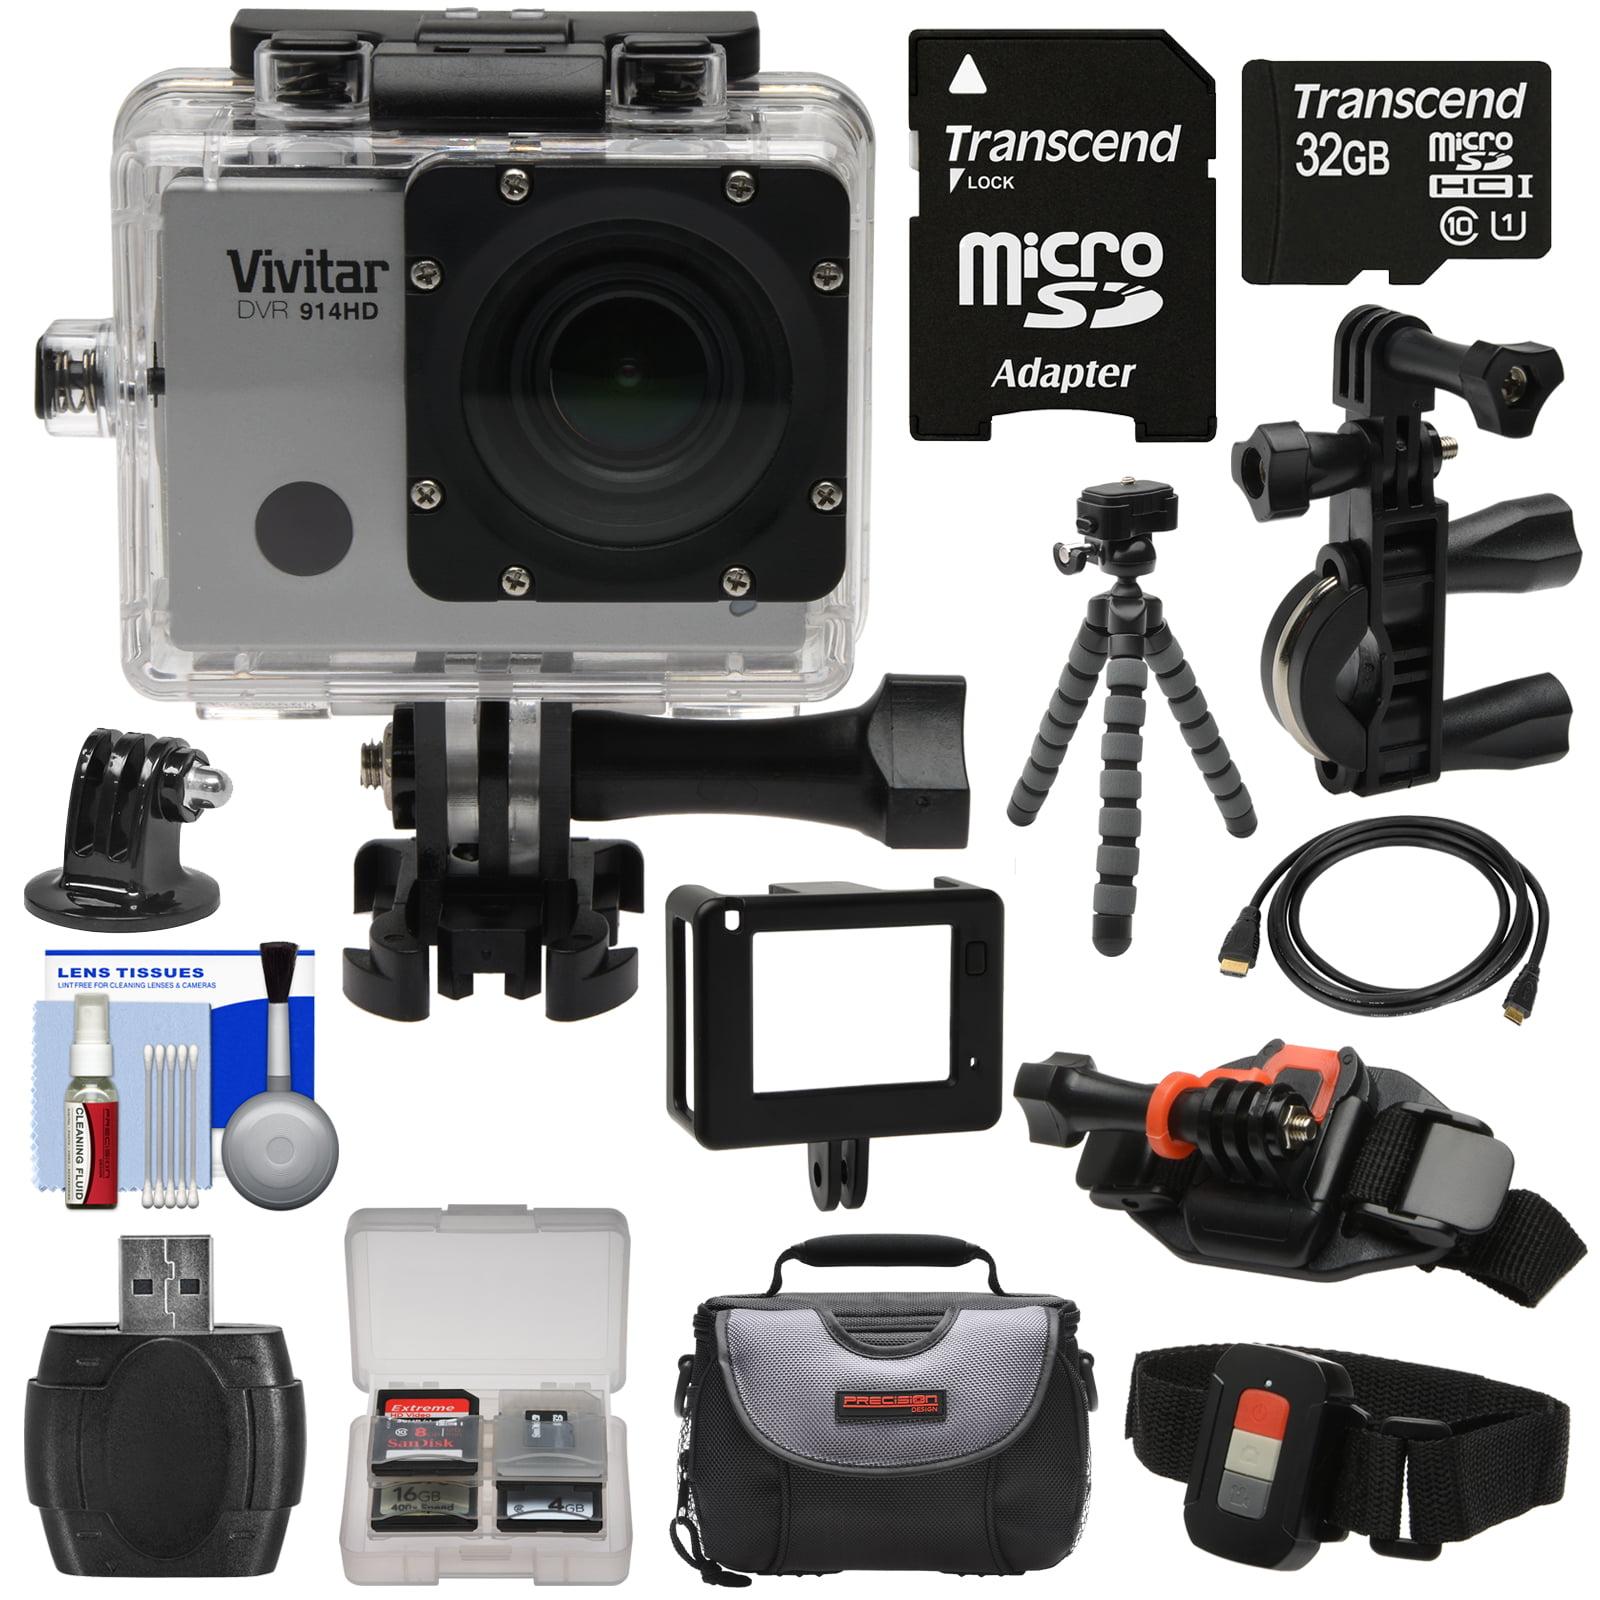 Vivitar DVR914HD 1440p HD Wi-Fi Waterproof Action Video Camera Camcorder (Black) + Remote, Vented Helmet & Bike Mounts + 32GB Card + Case + Tripod Kit